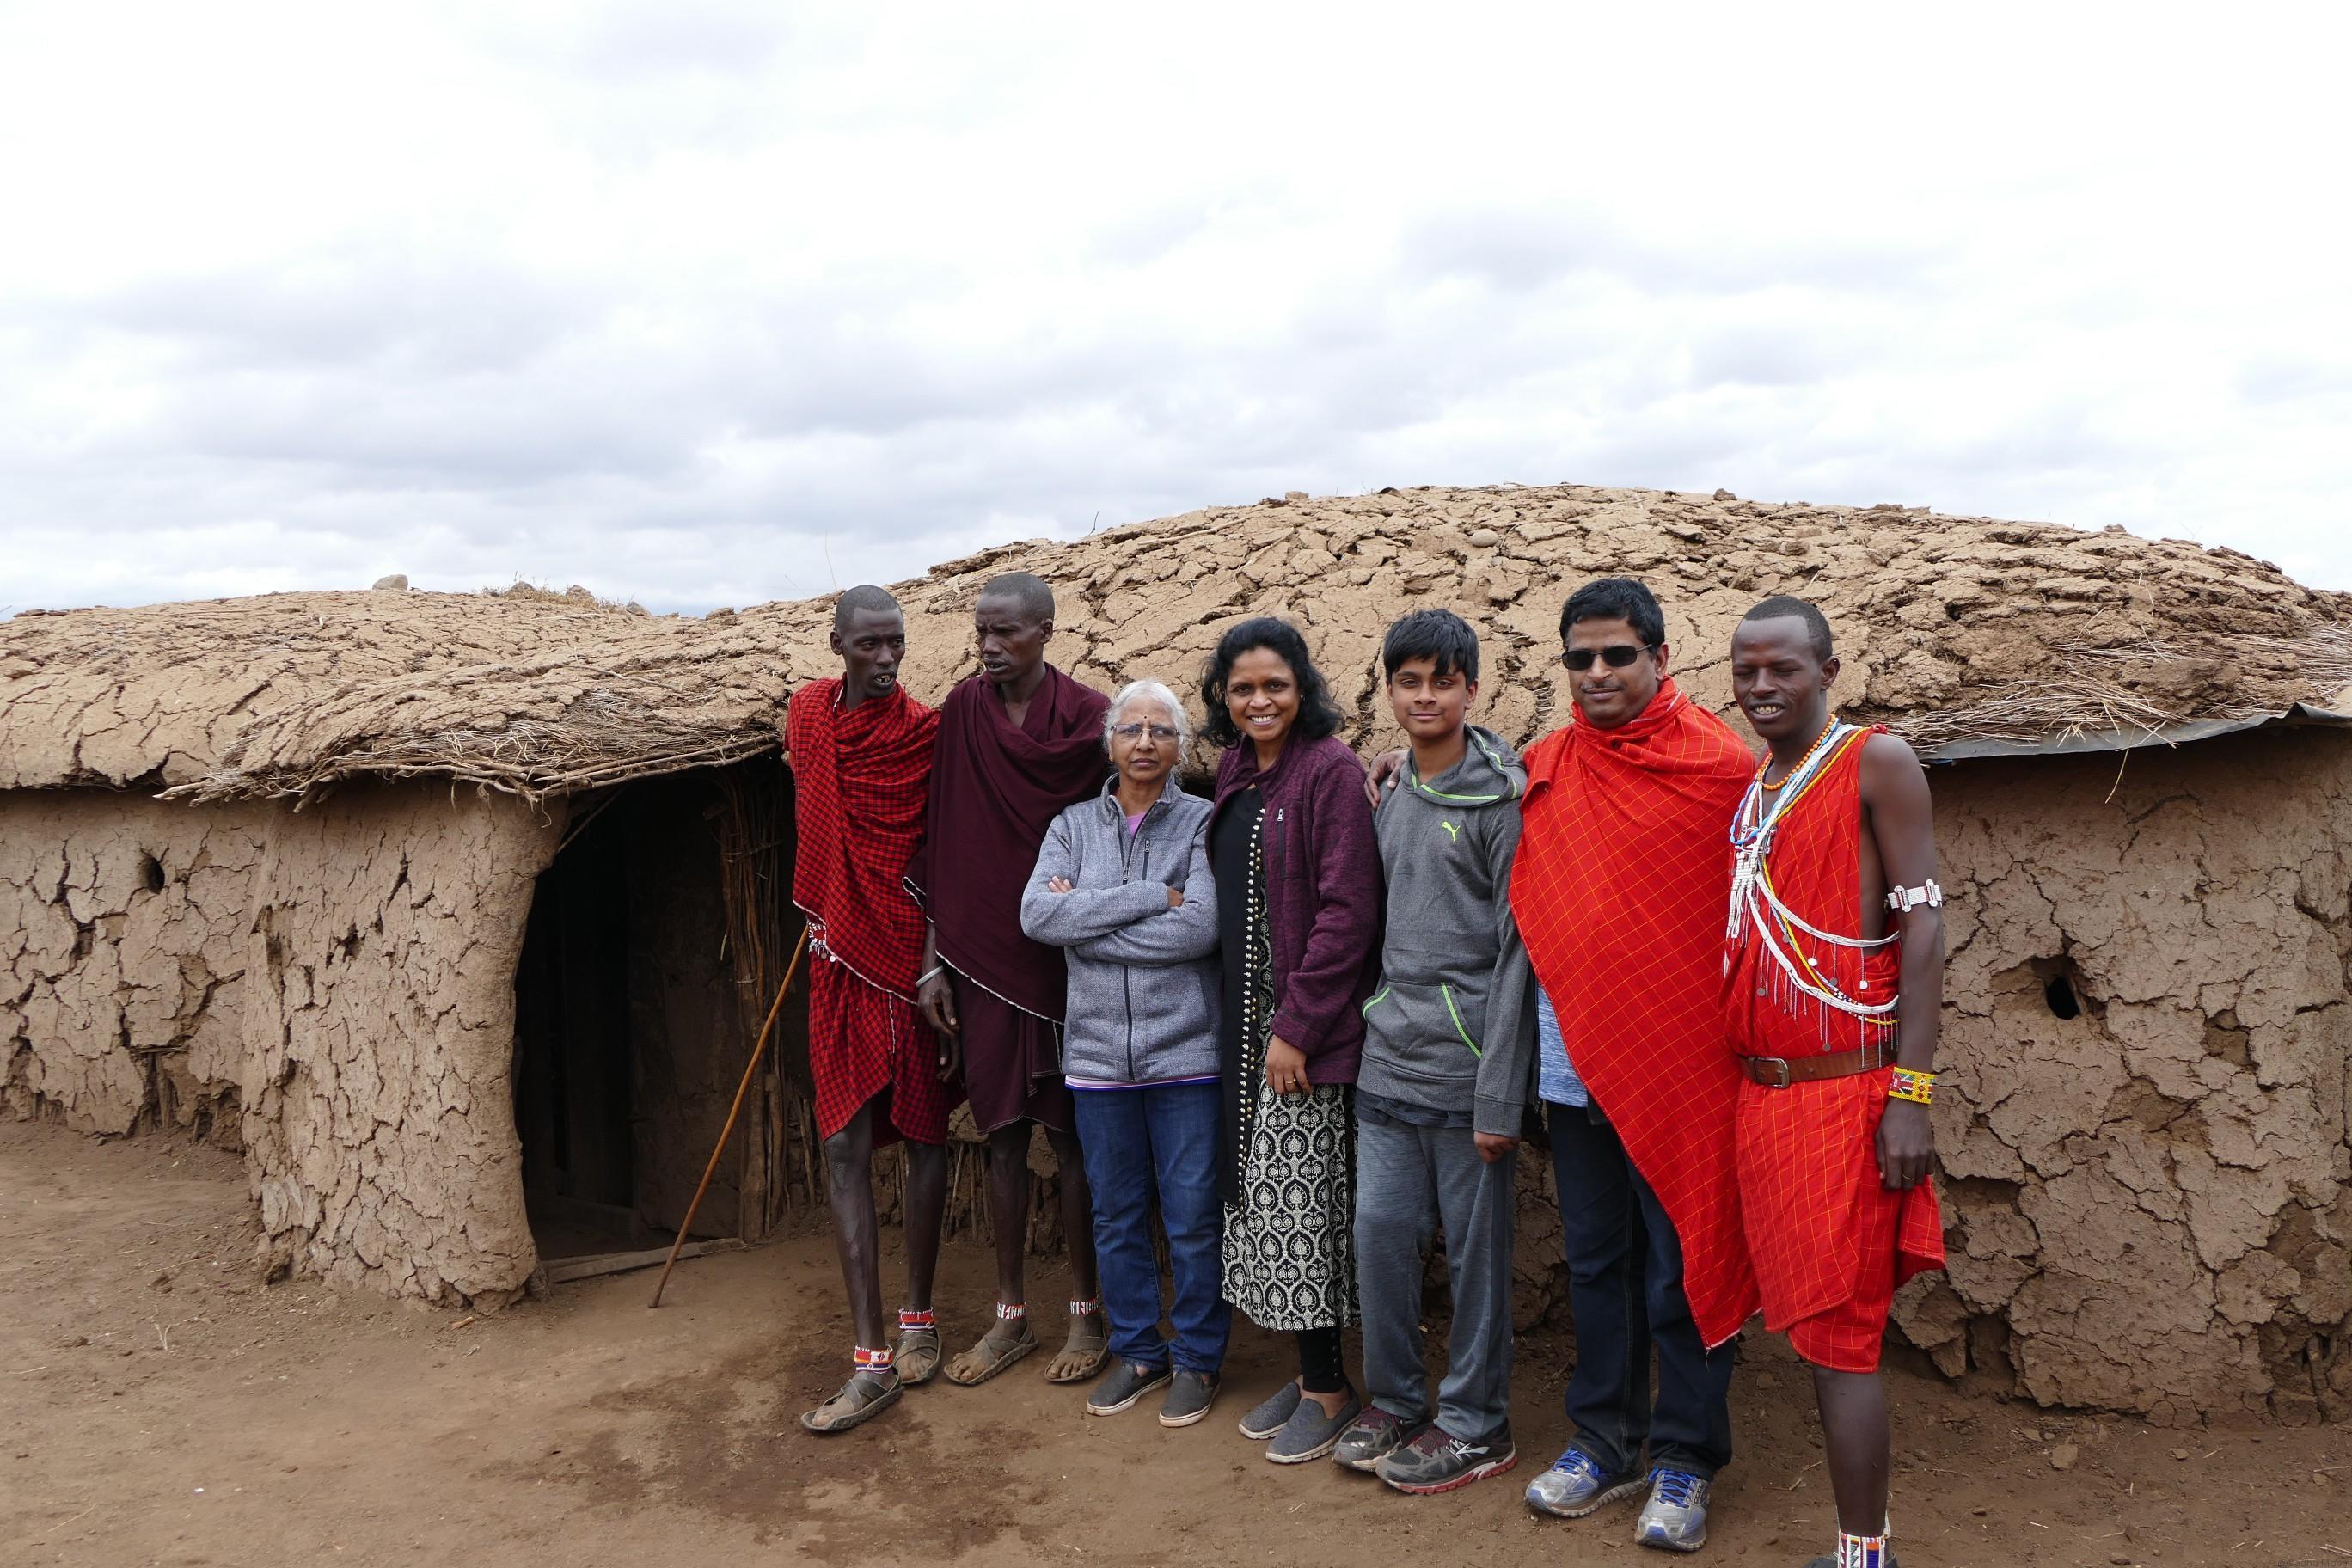 Meeting Masai people